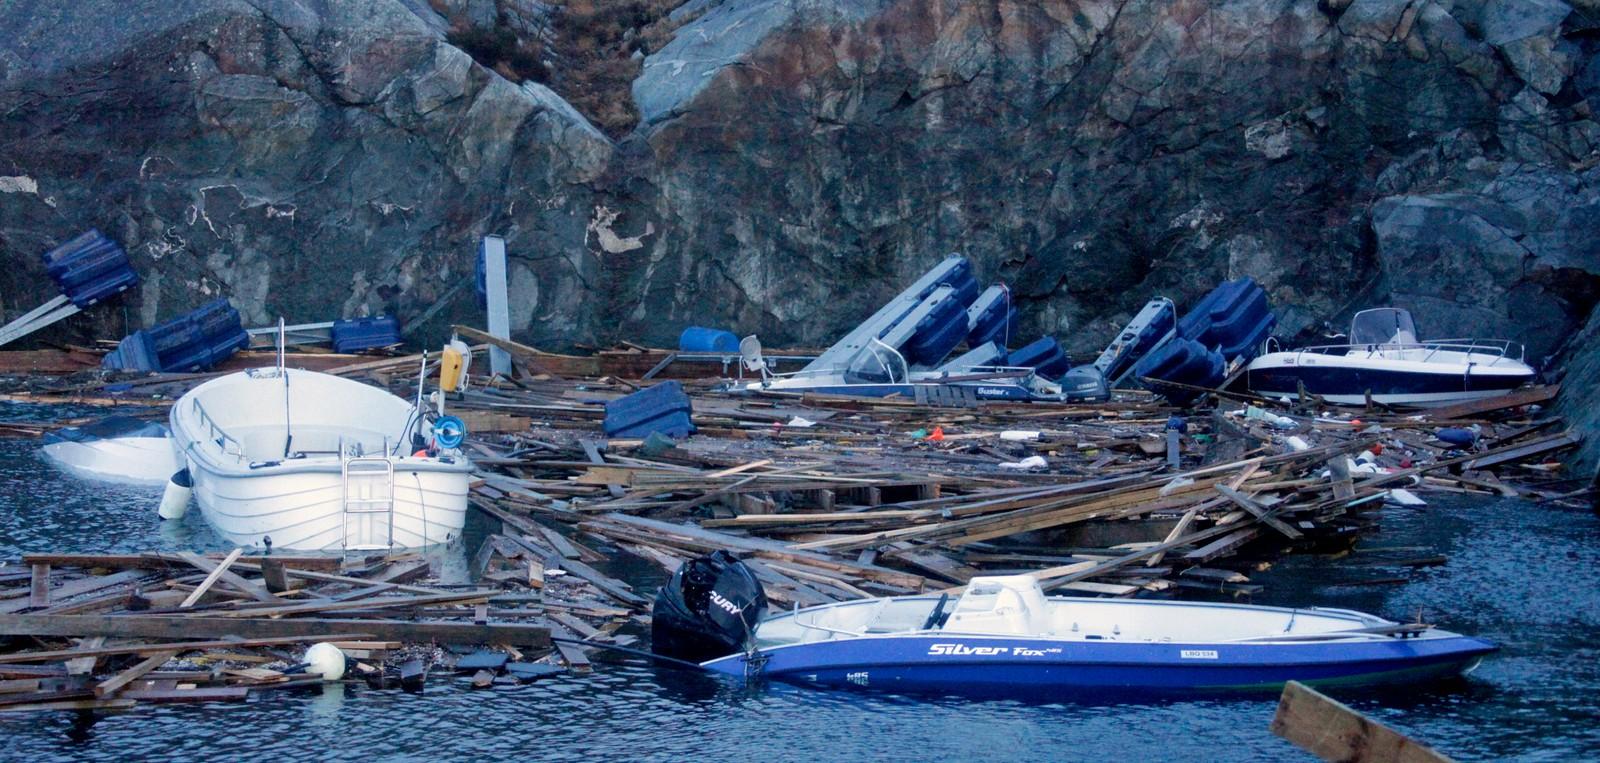 Store skader på båter og kai i Eltravågen på Sveio